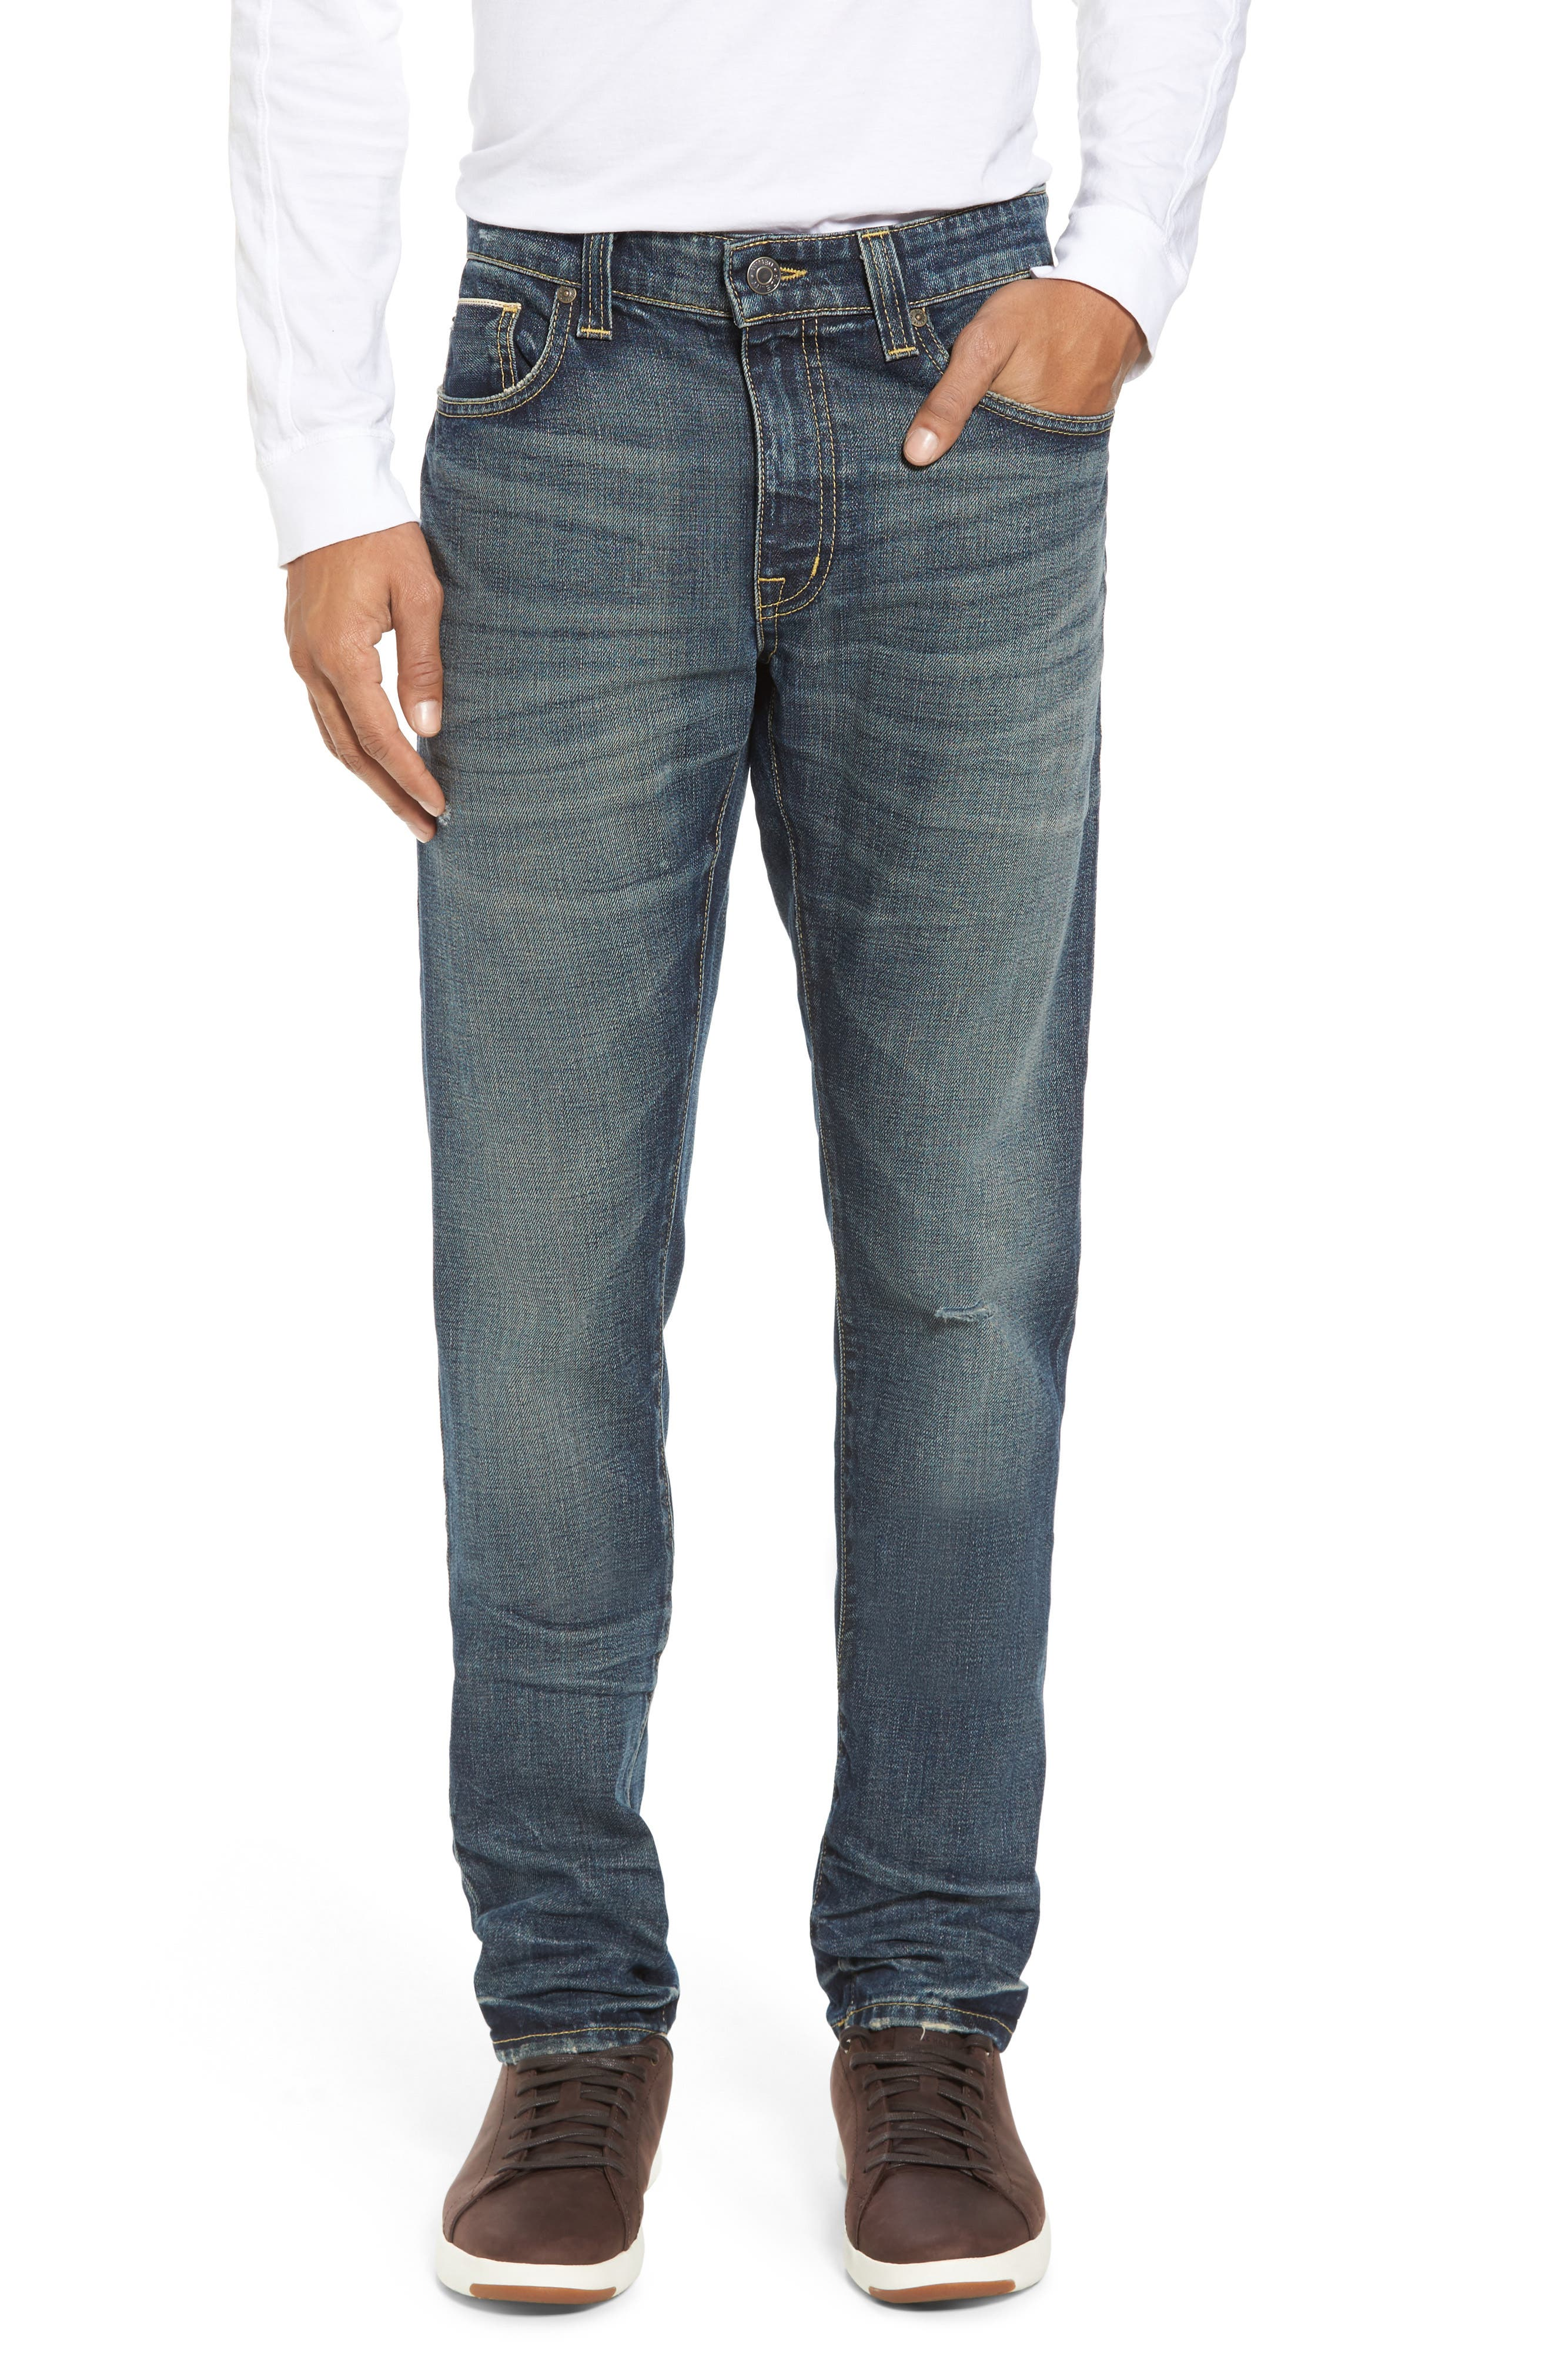 Fideltiy Denim Torino Slim Fit Jeans,                             Main thumbnail 1, color,                             400